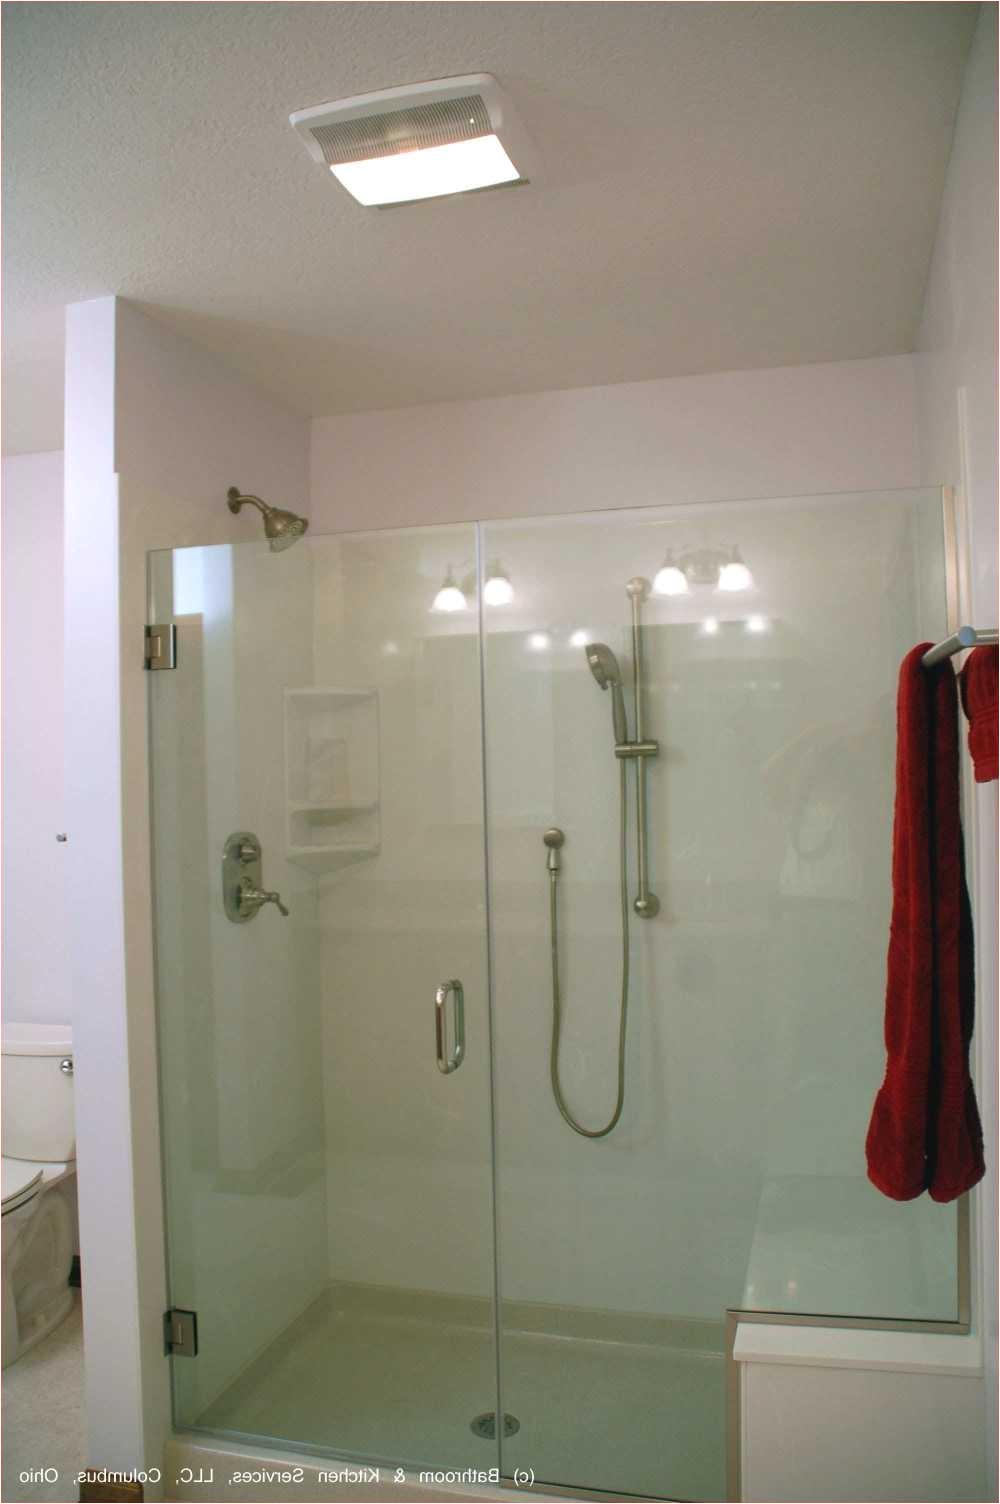 bathroom showers elegant bathroom shower light new h sink install bathroom i 0d exciting diy of